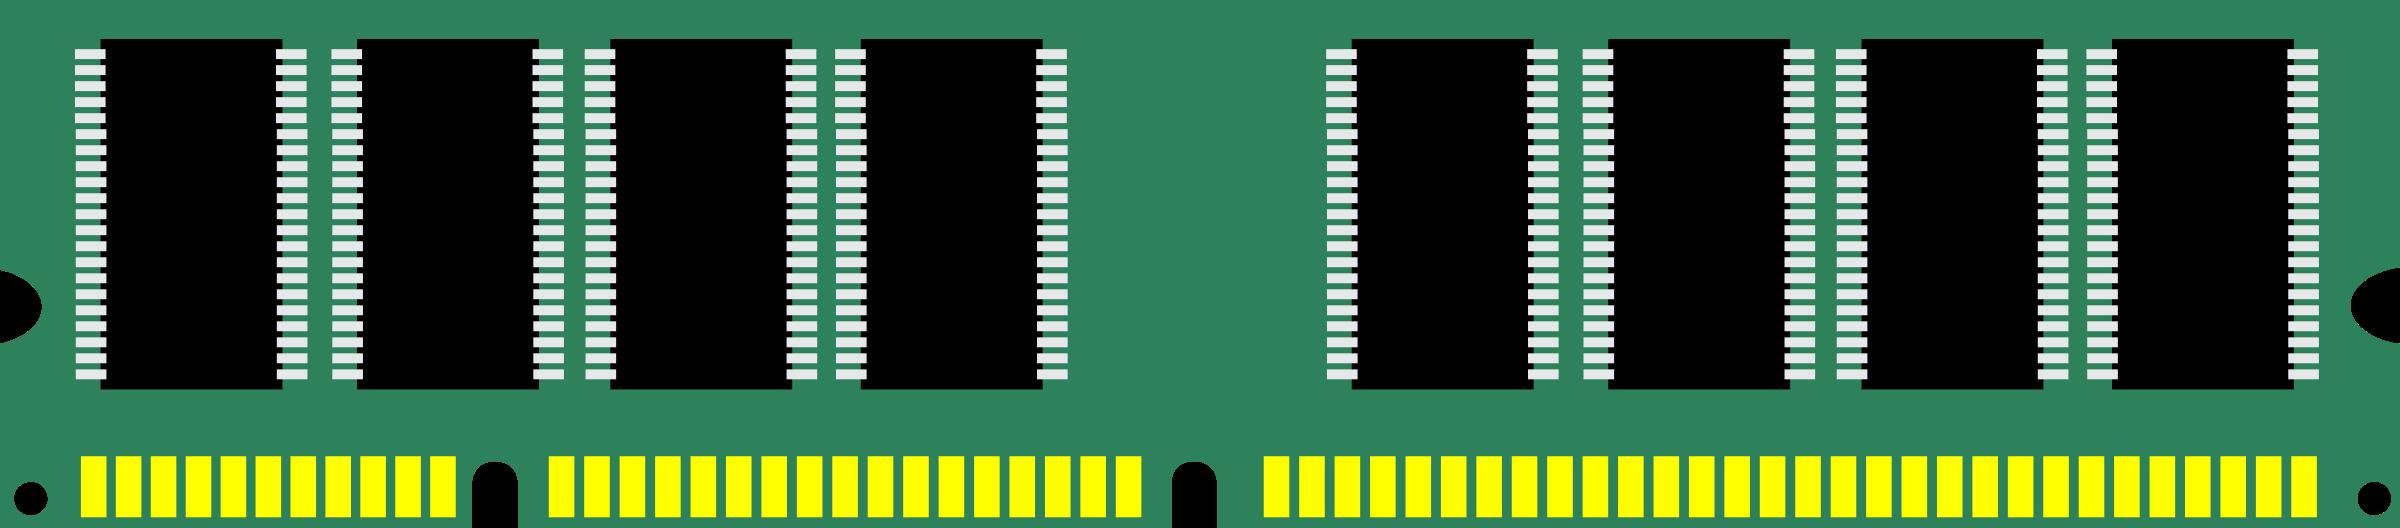 Random Access Memory Clipart.